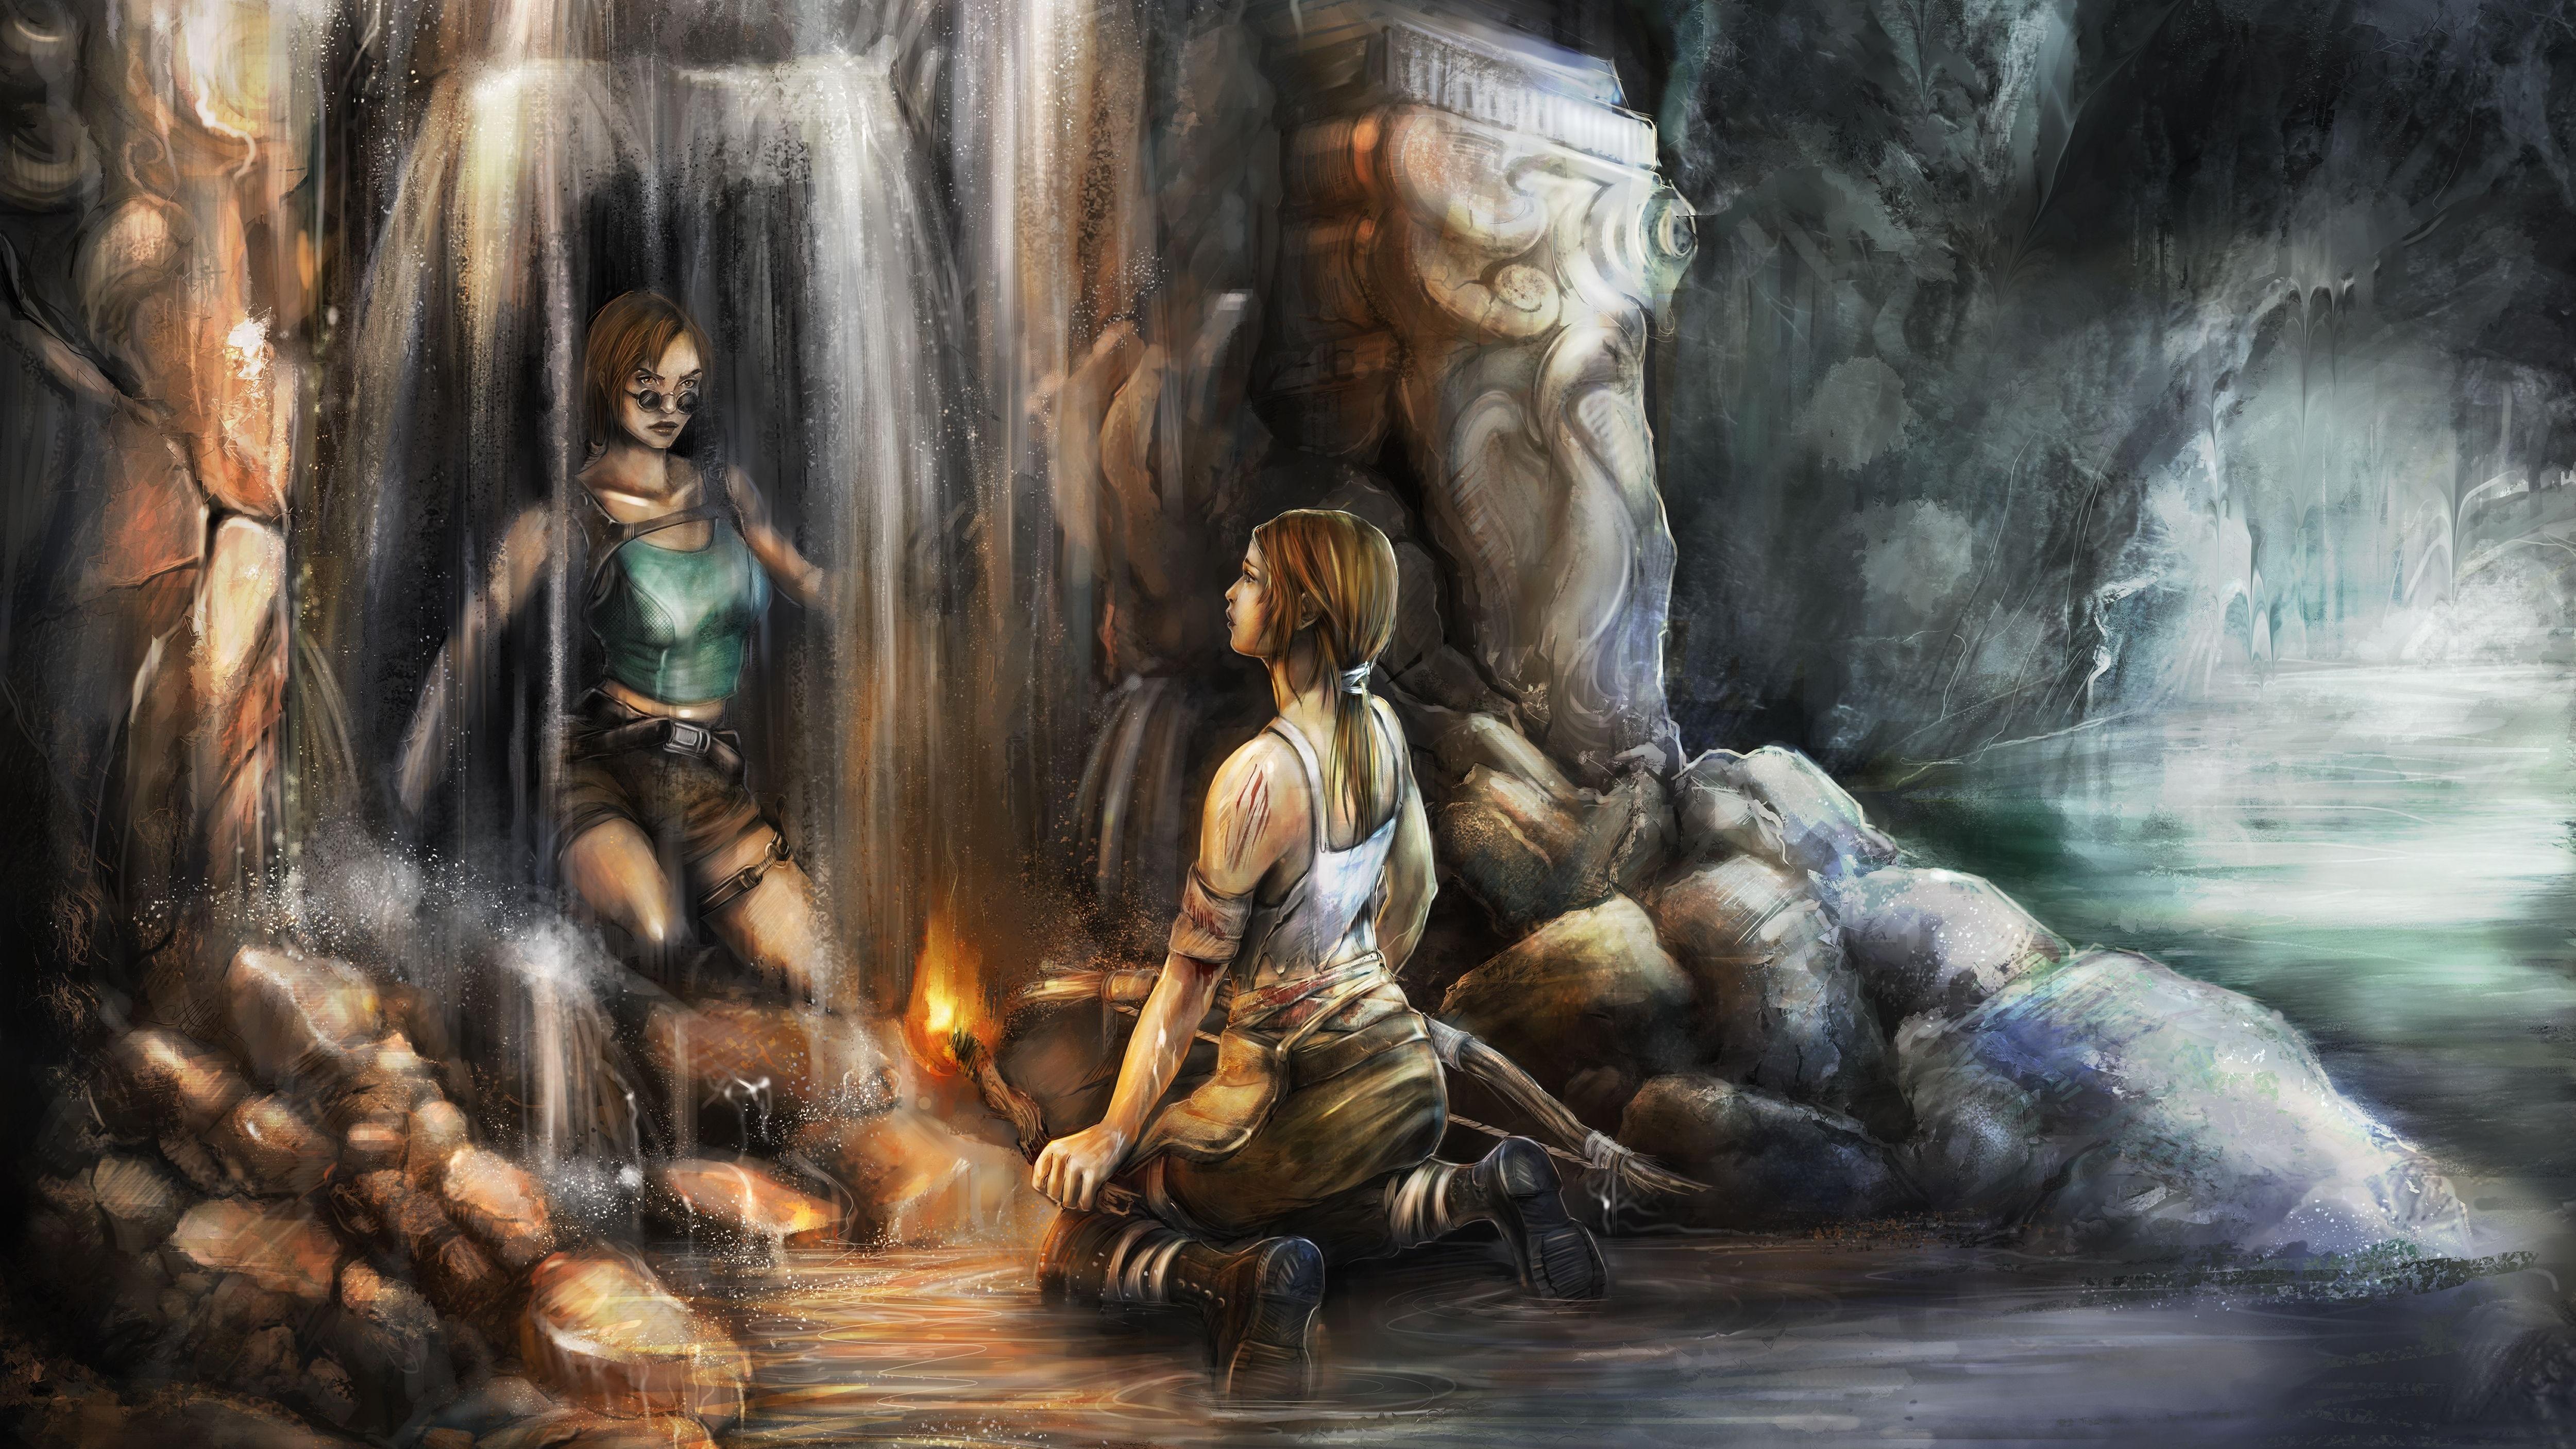 Tomb Raider 4k Ultra HD Wallpaper   Background Image ...